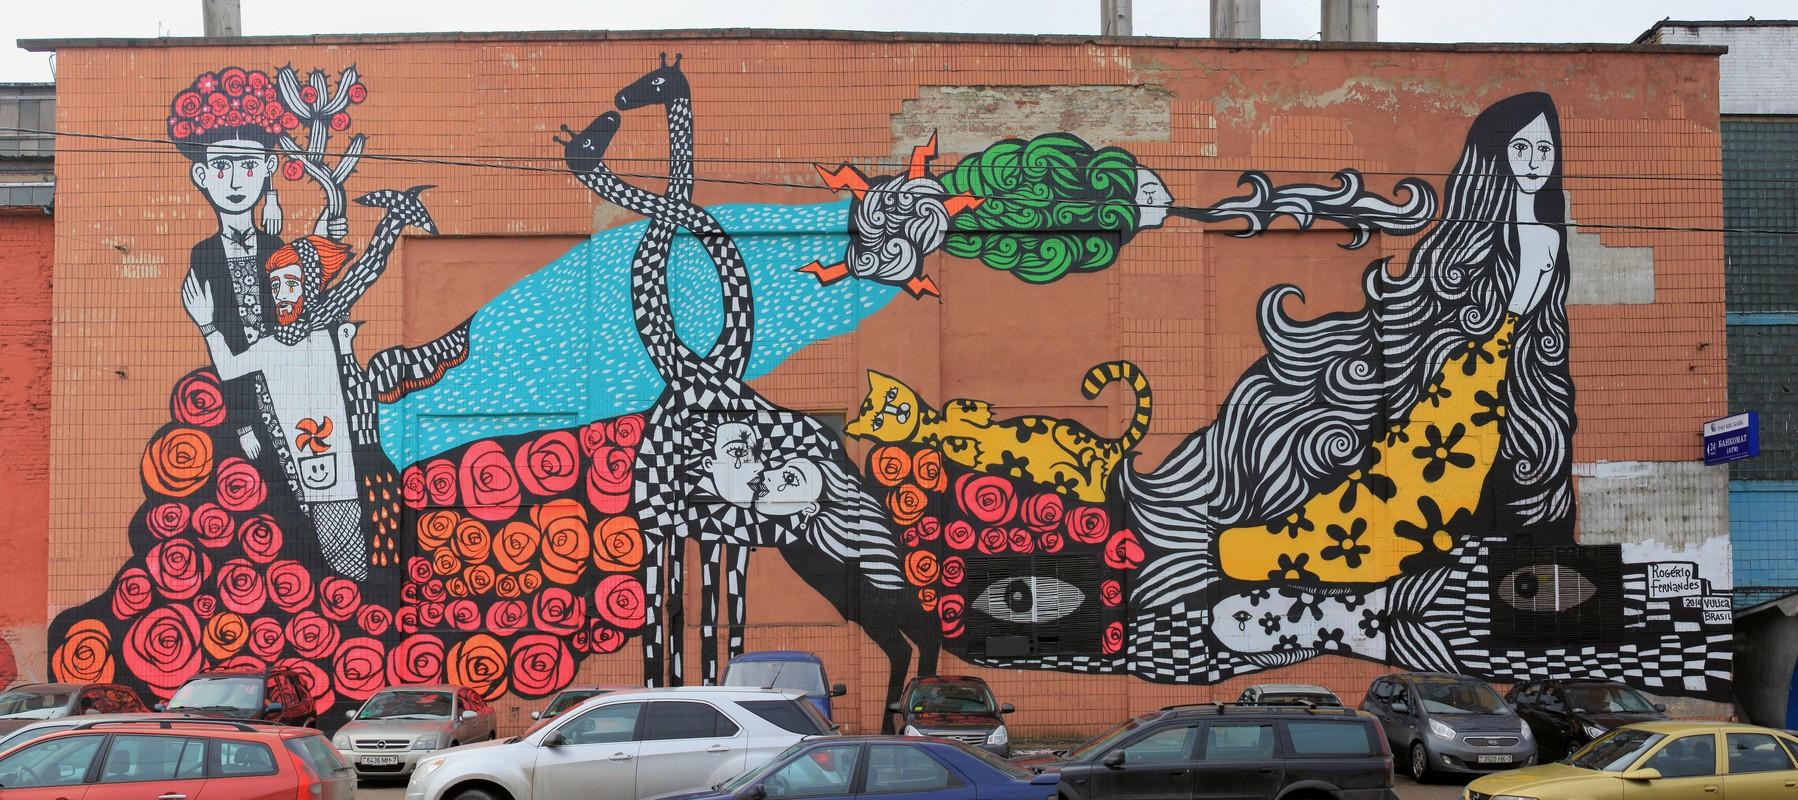 oktyabrskaya street graffiti minsk